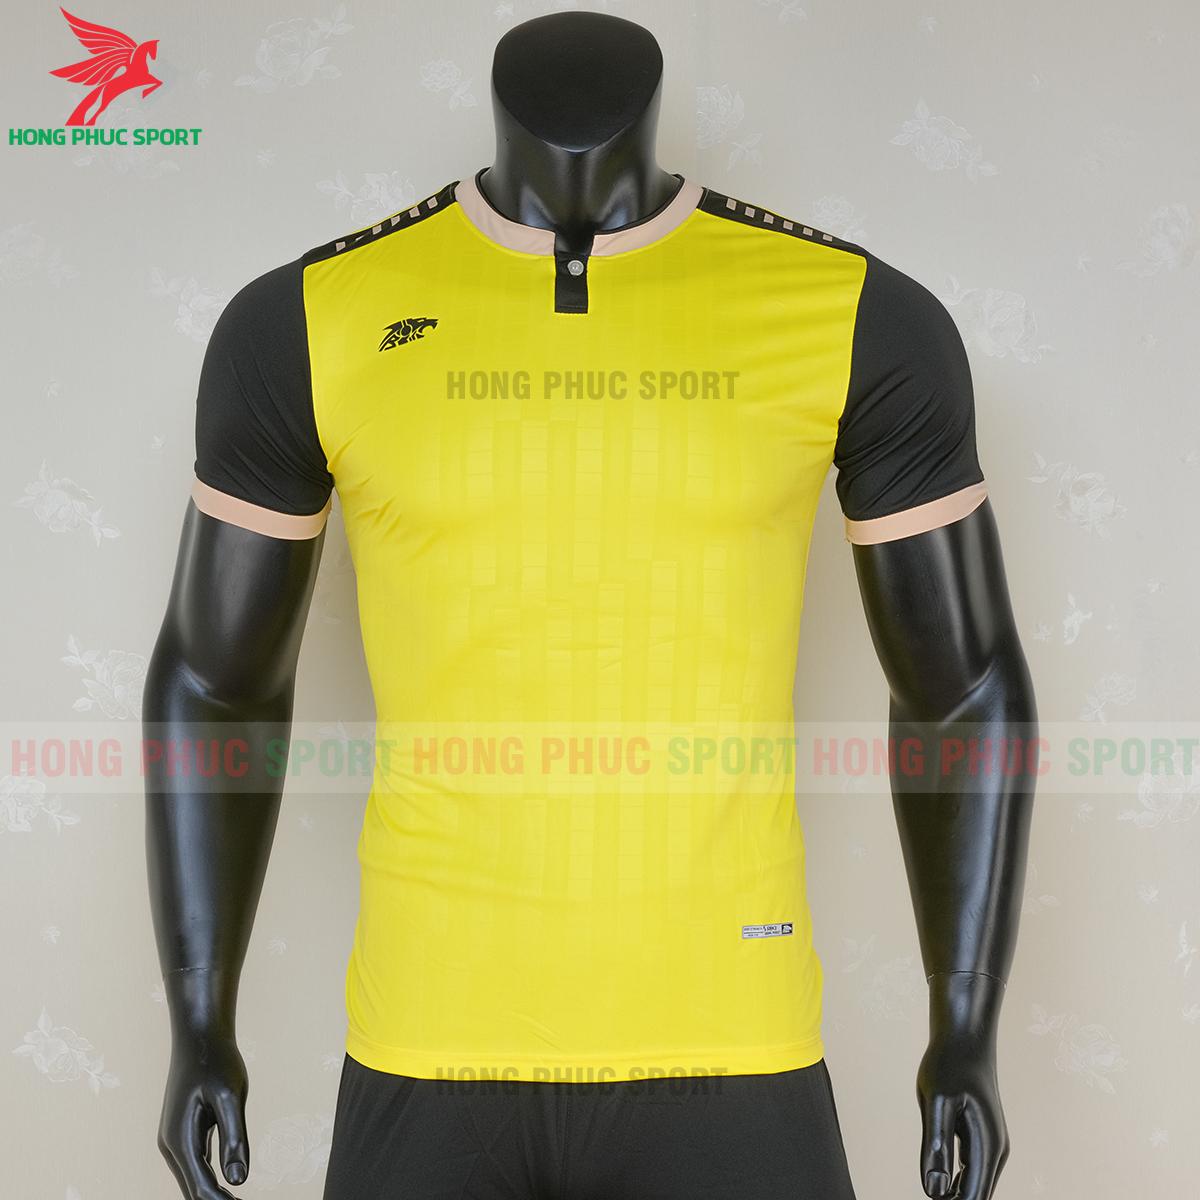 https://cdn.hongphucsport.com/unsafe/s4.shopbay.vn/files/285/ao-bong-da-khong-logo-riki-neck-mau-vang-5-5f71adf9622b9.png